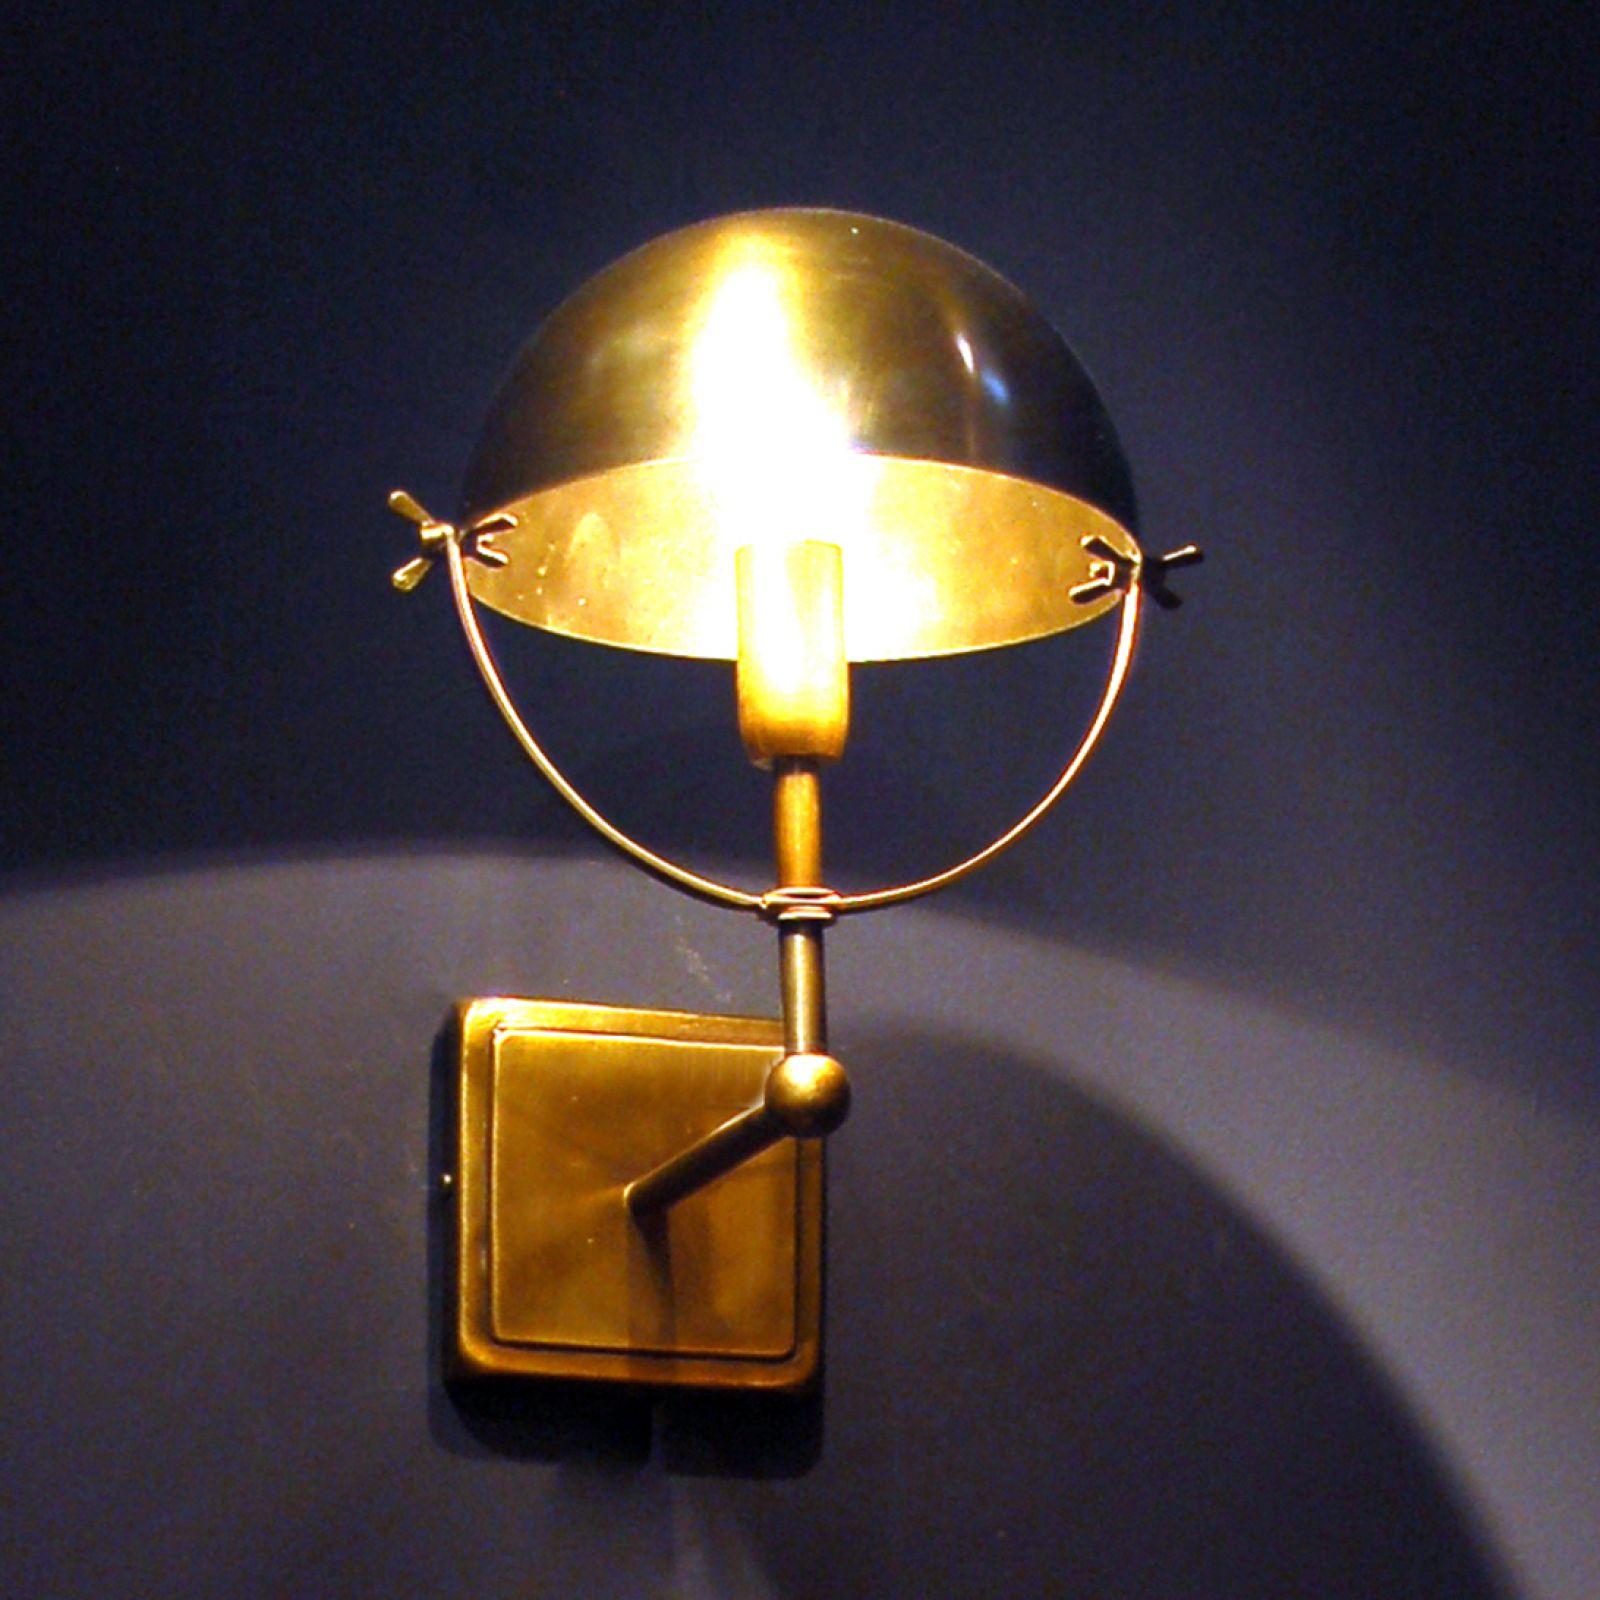 Large Internal Wall Lights : Brass wall lamp - Interior Wall Lights